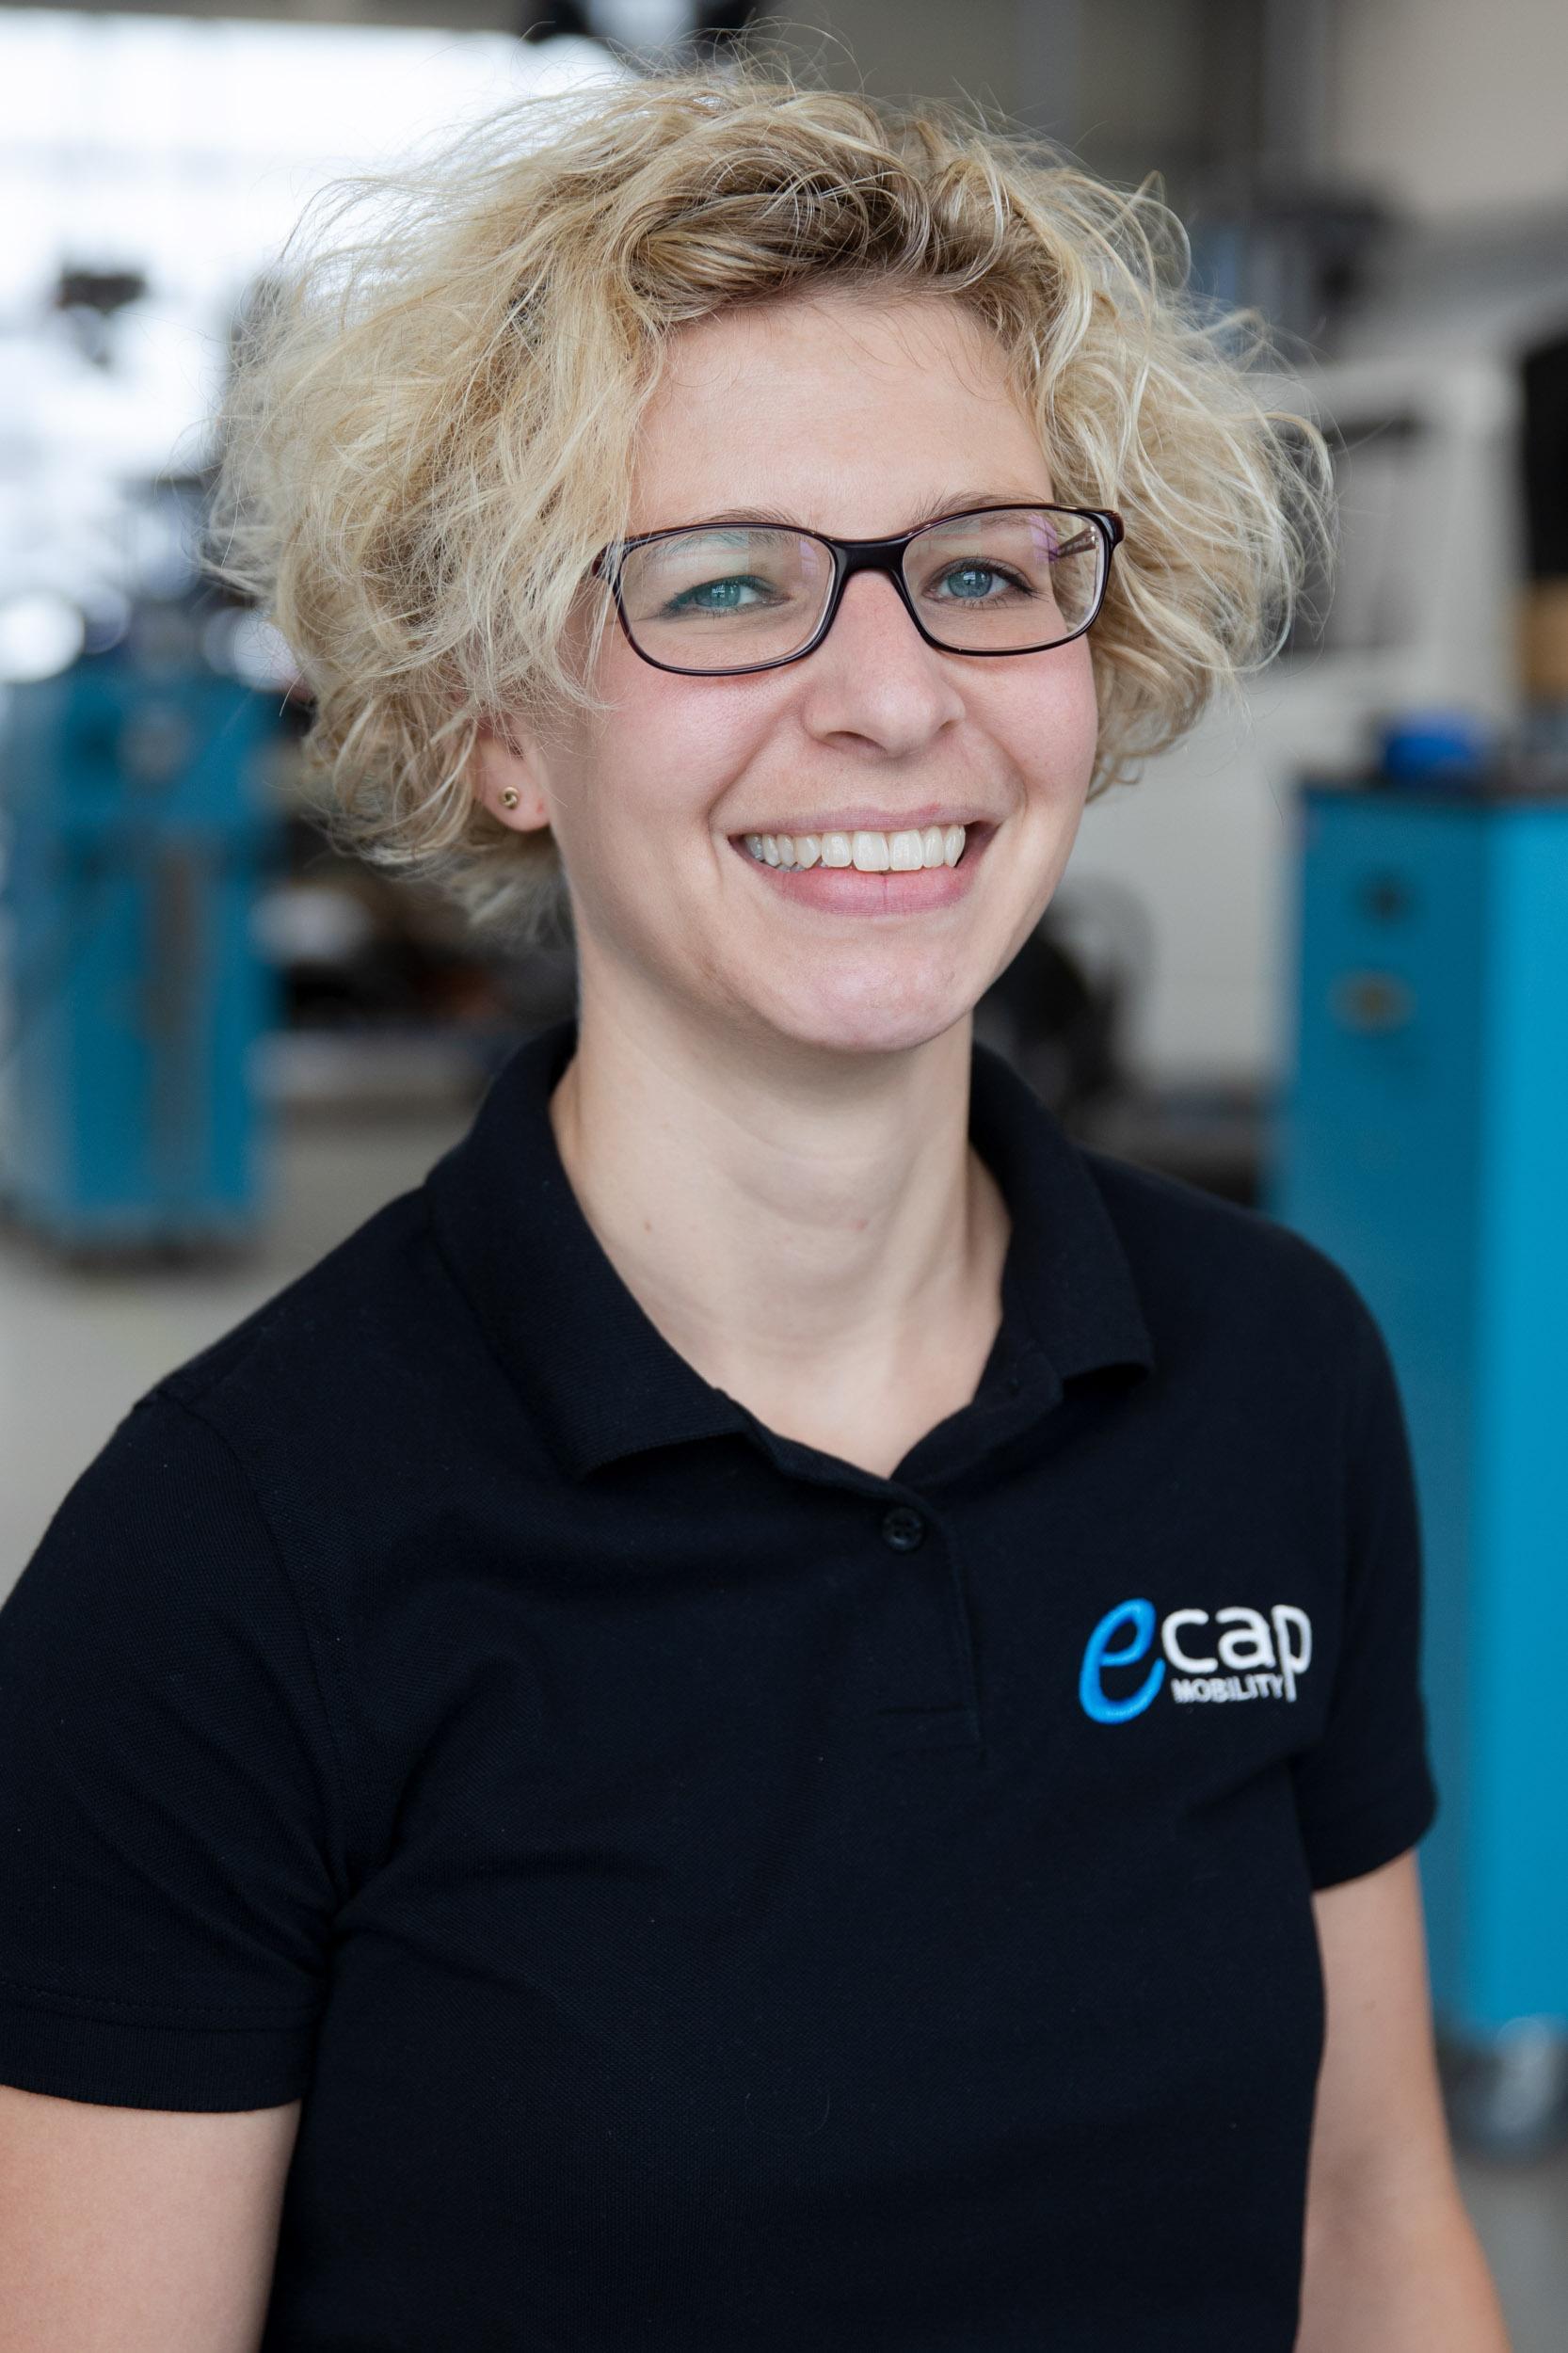 Anna Maack | Buchhaltung  ama@ecap-mobility.com